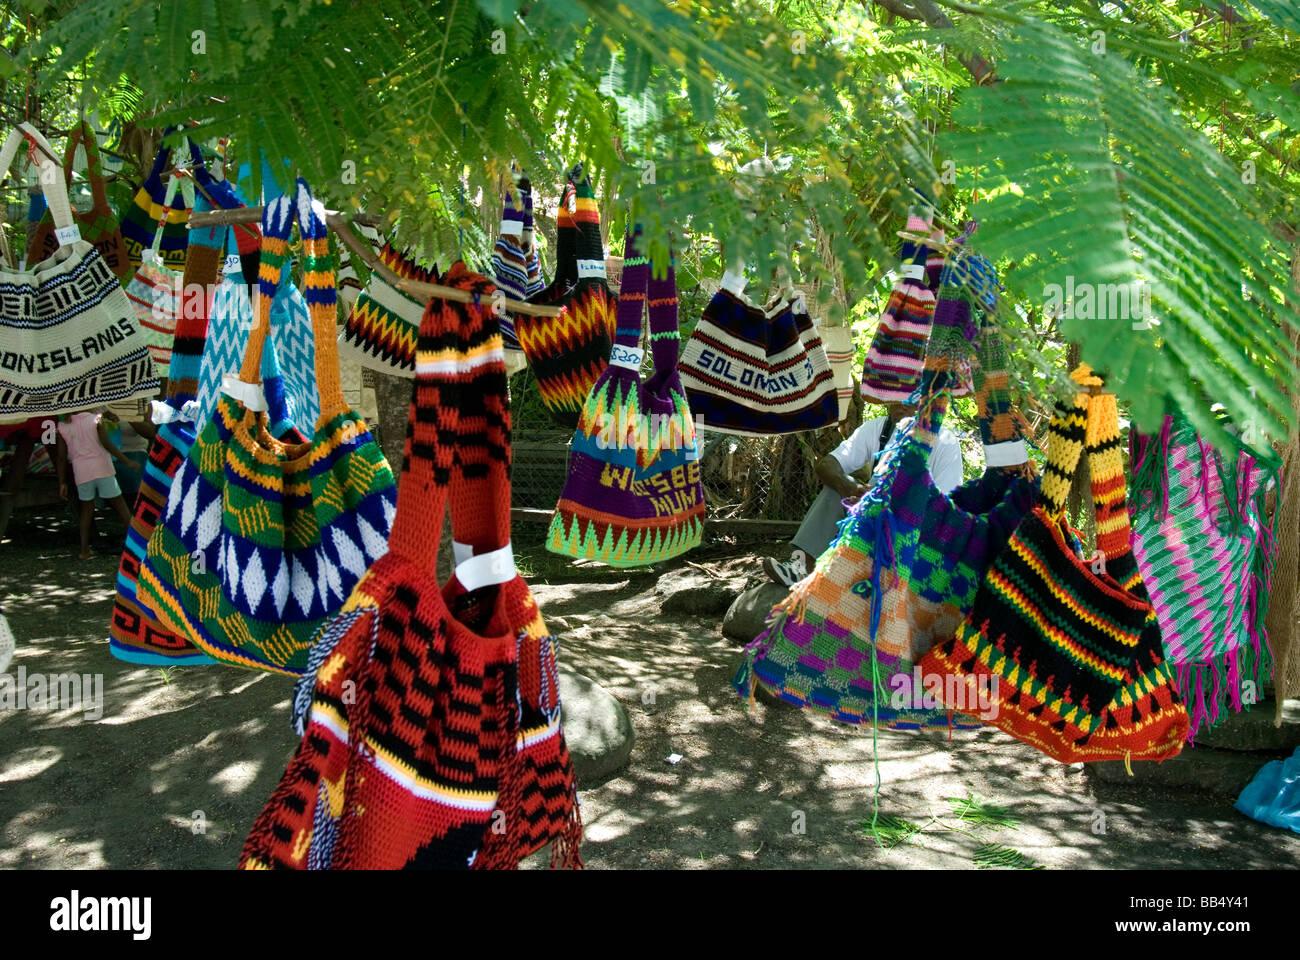 The Bilum Tree, Honiara, Solomon Islands - Stock Image